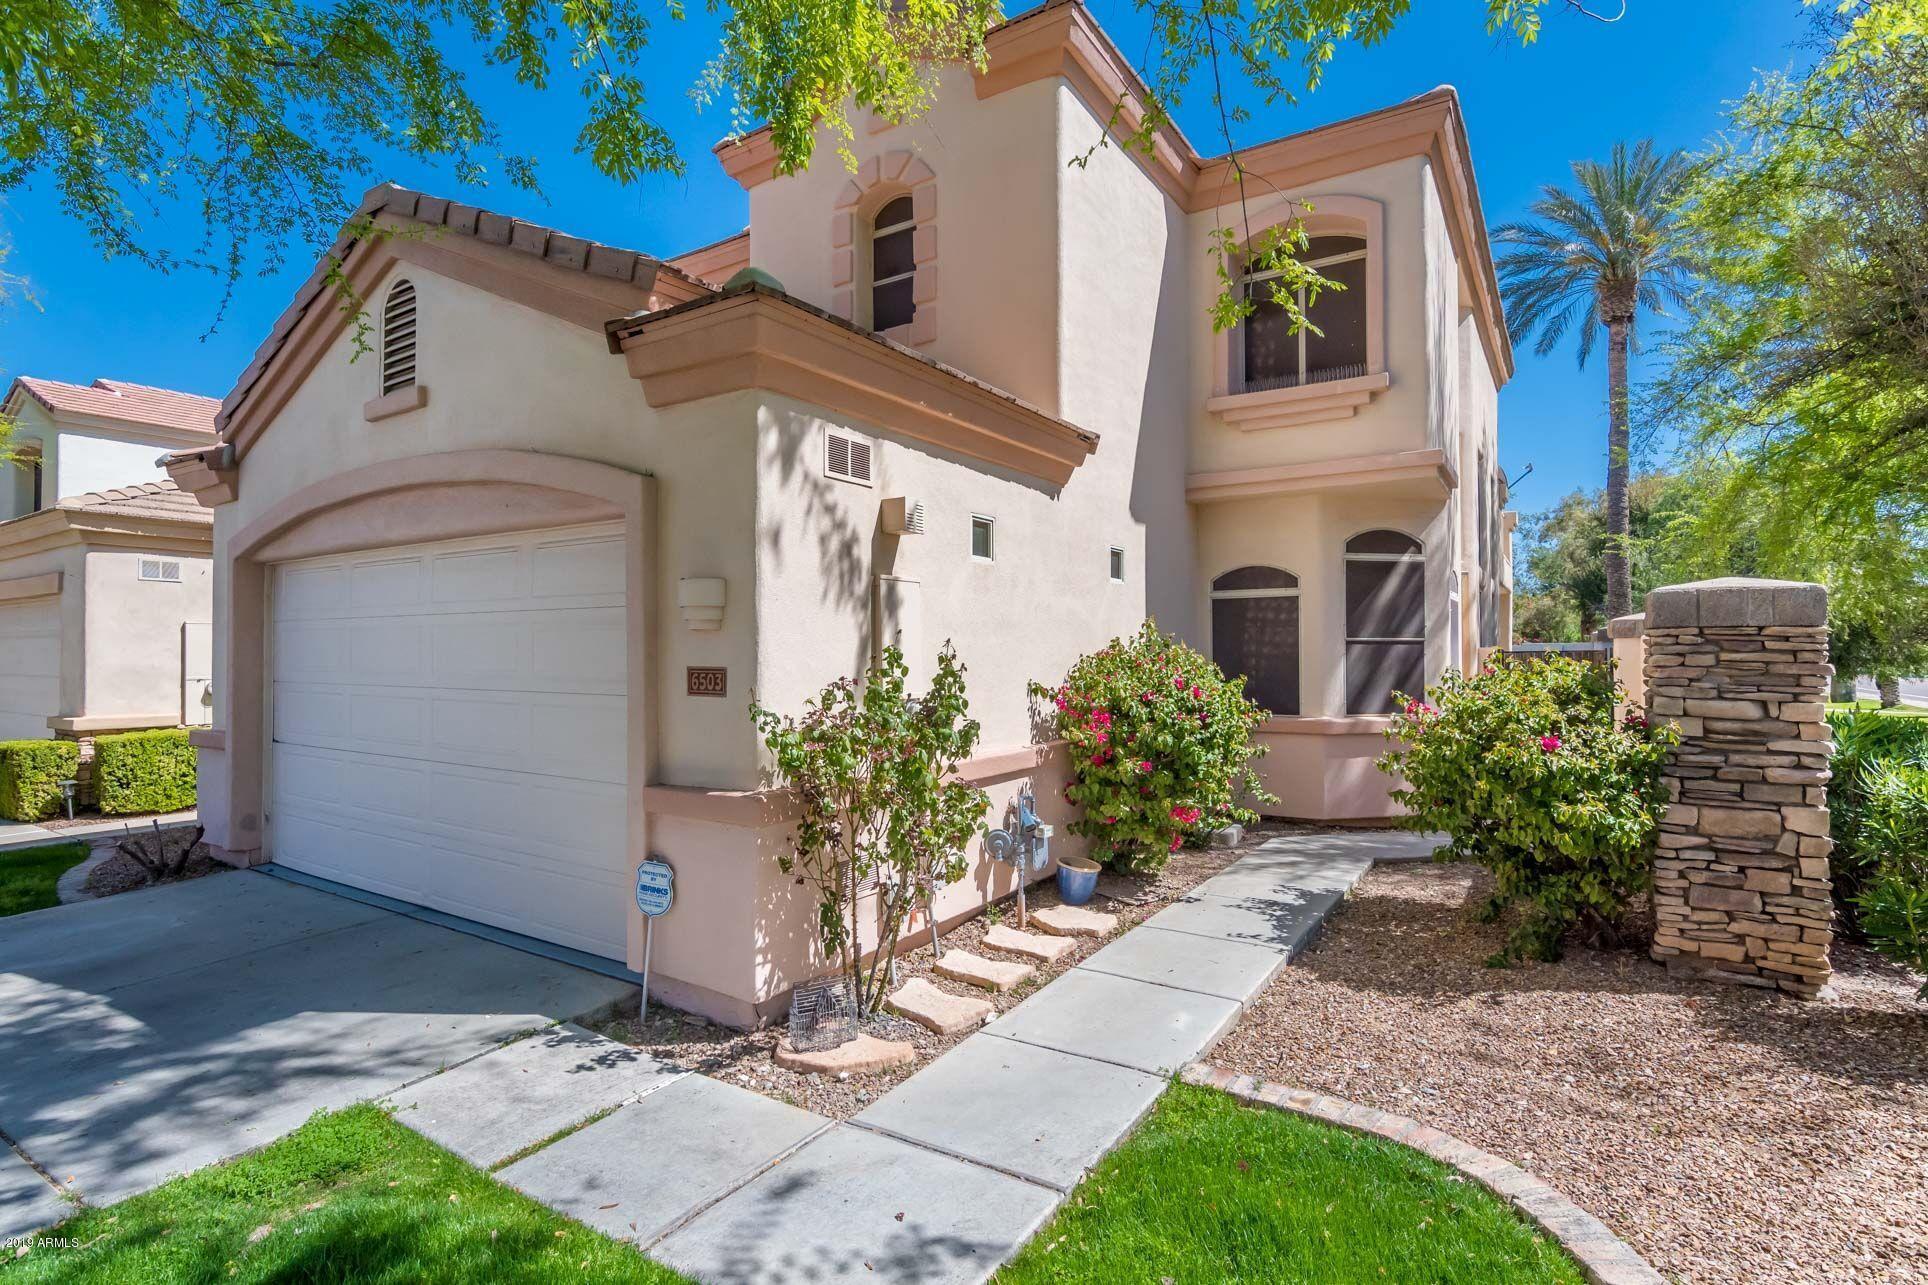 Photo of 6503 N 14TH Place, Phoenix, AZ 85014